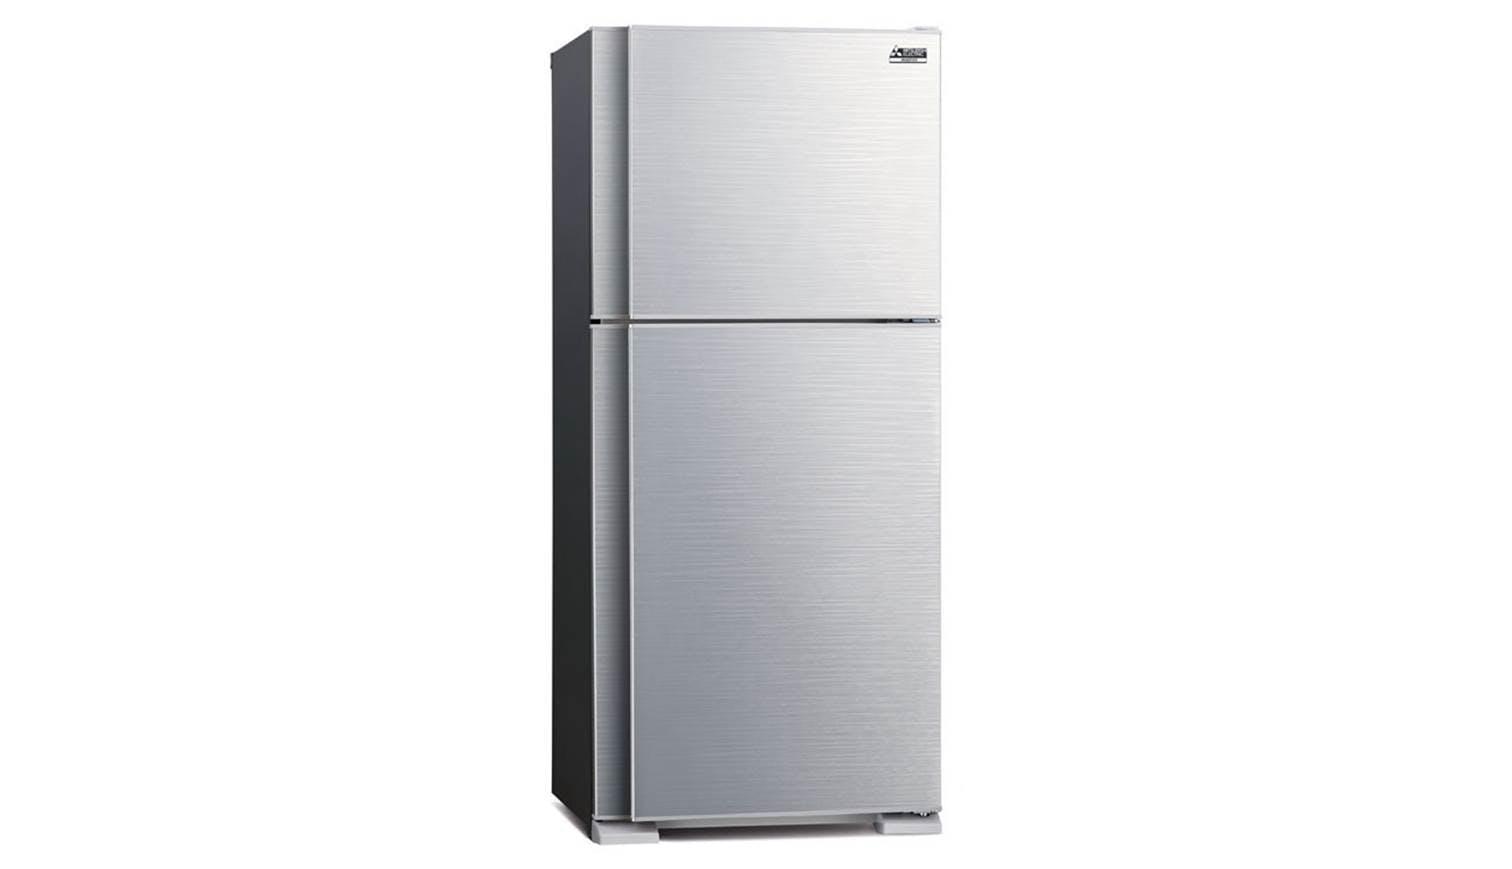 Mitsubishi Mr F62eg Slw P 560l 2 Doors Refrigerator